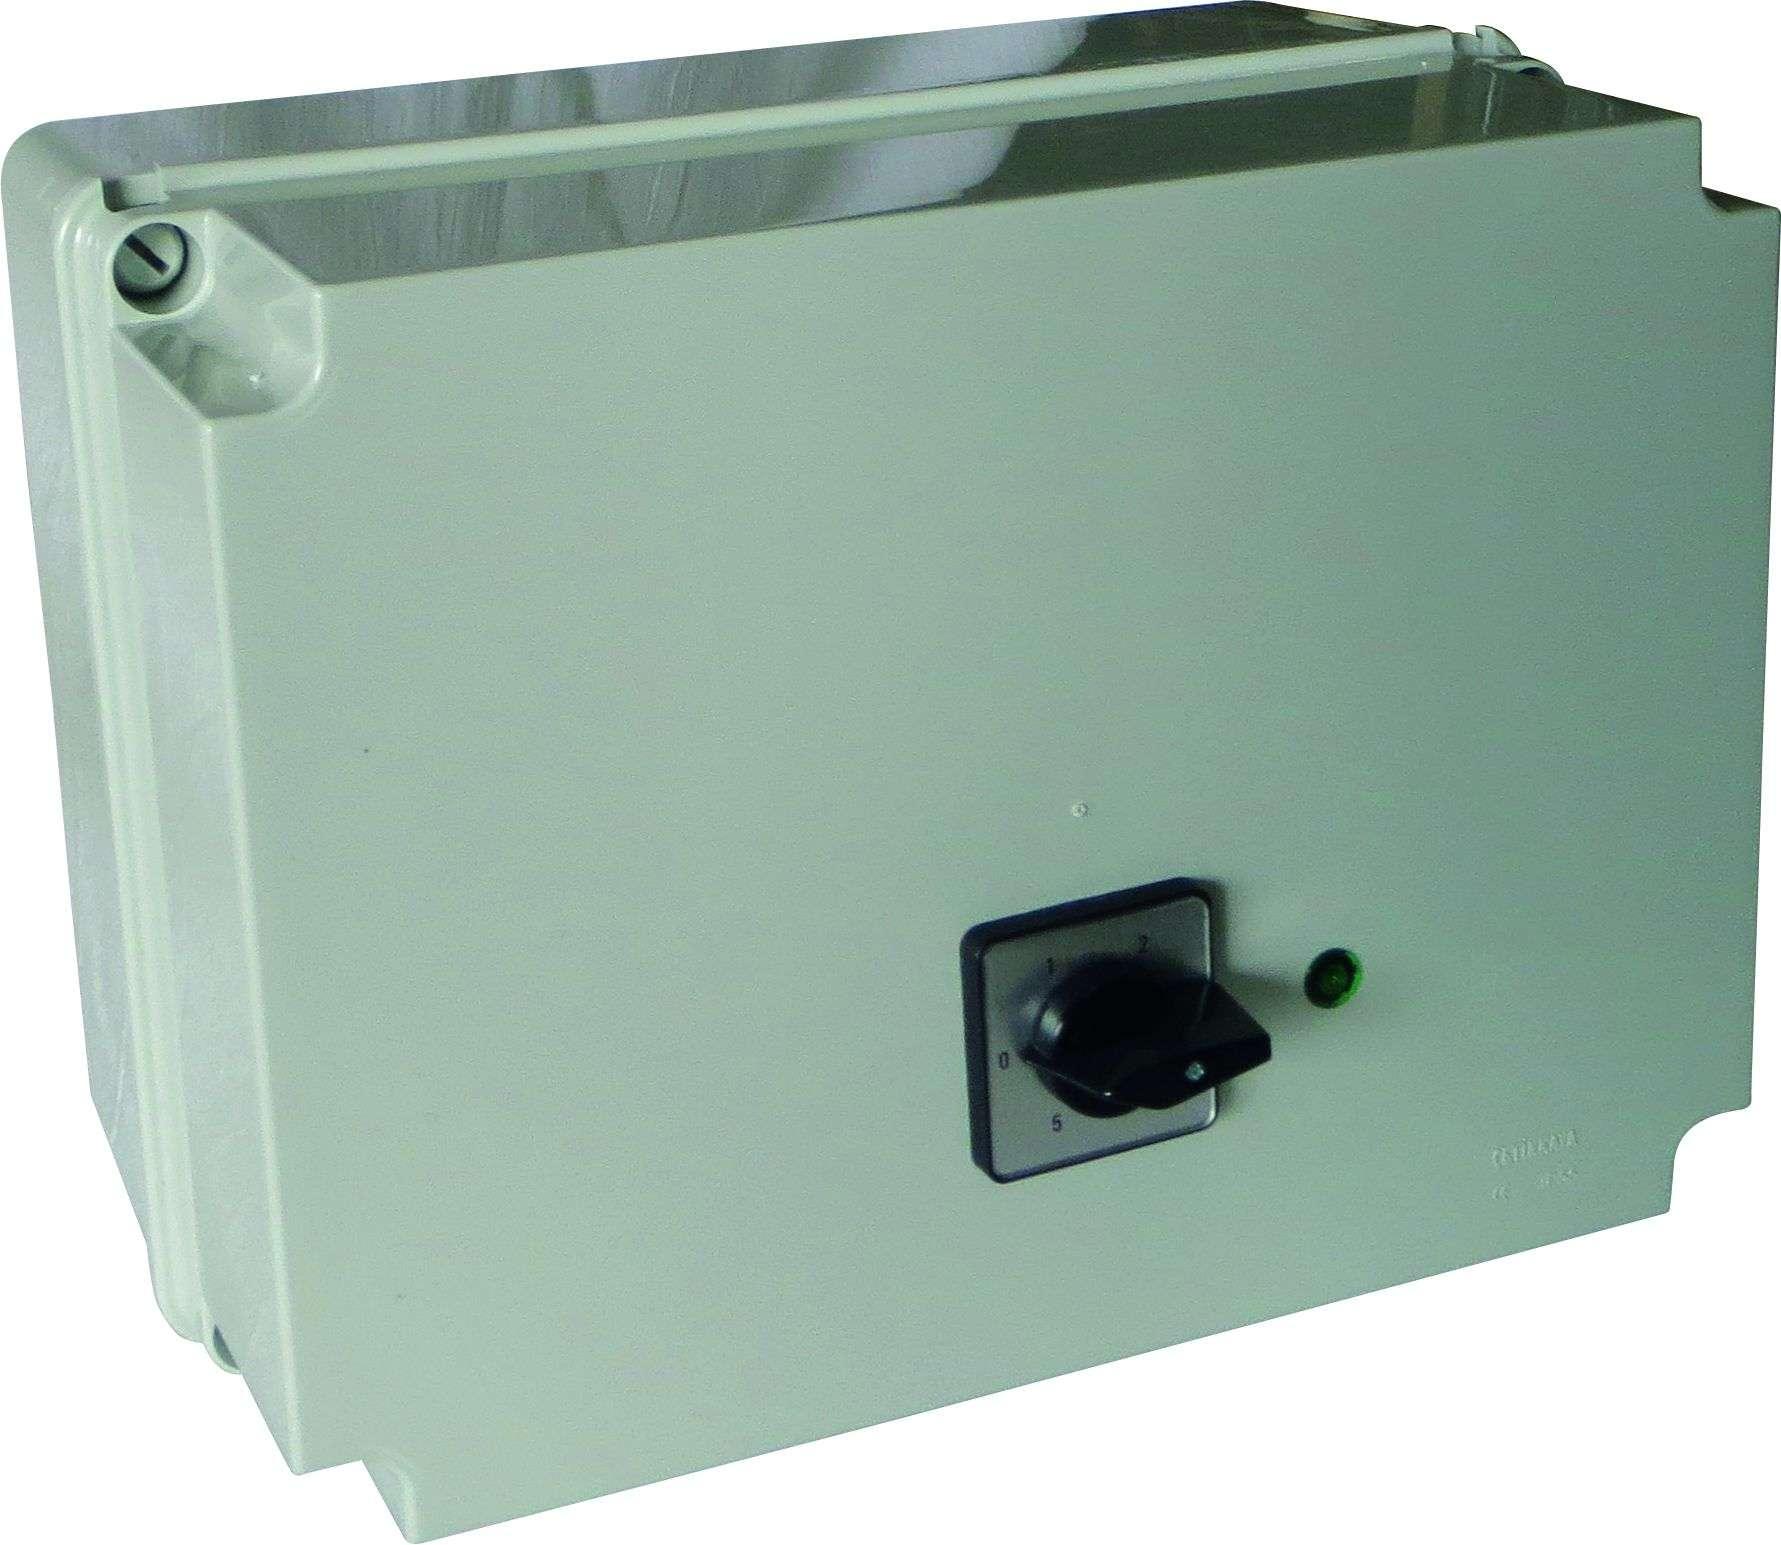 Mehrfunktionsdrehzahlregler, 230V, 5 Ampere | 230 V | Regler ...